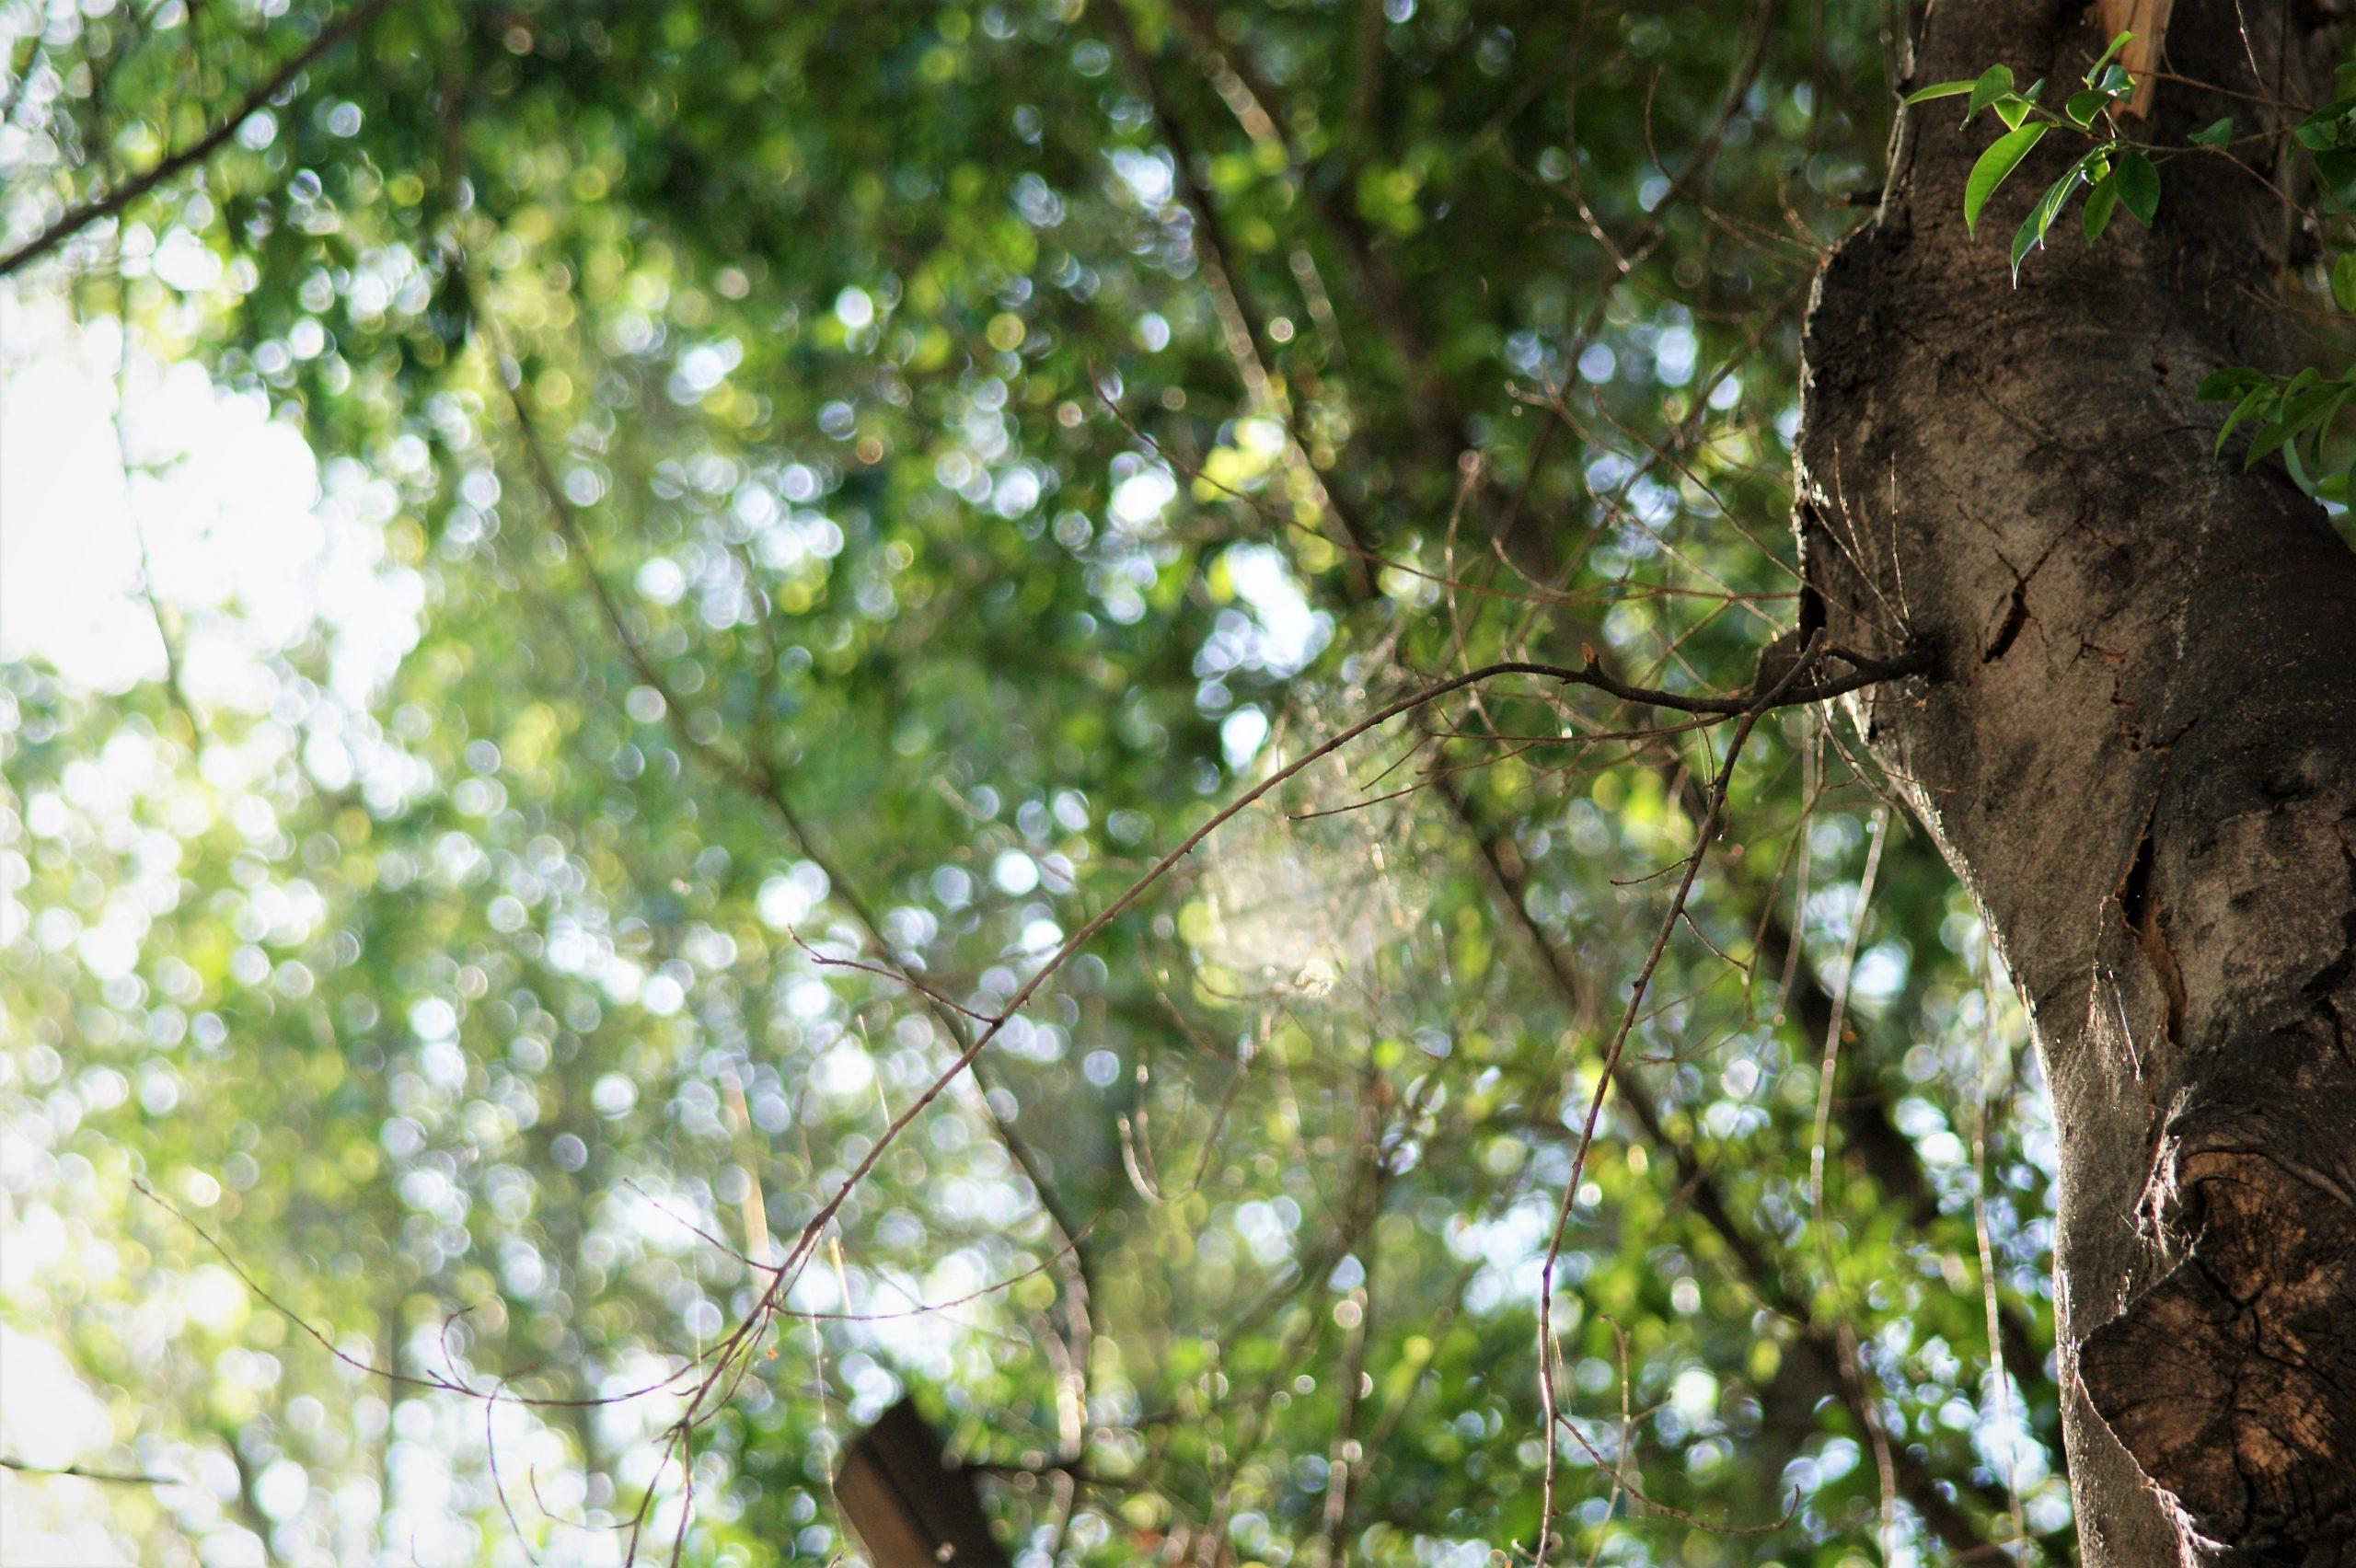 Sotto un albero vive un bosco